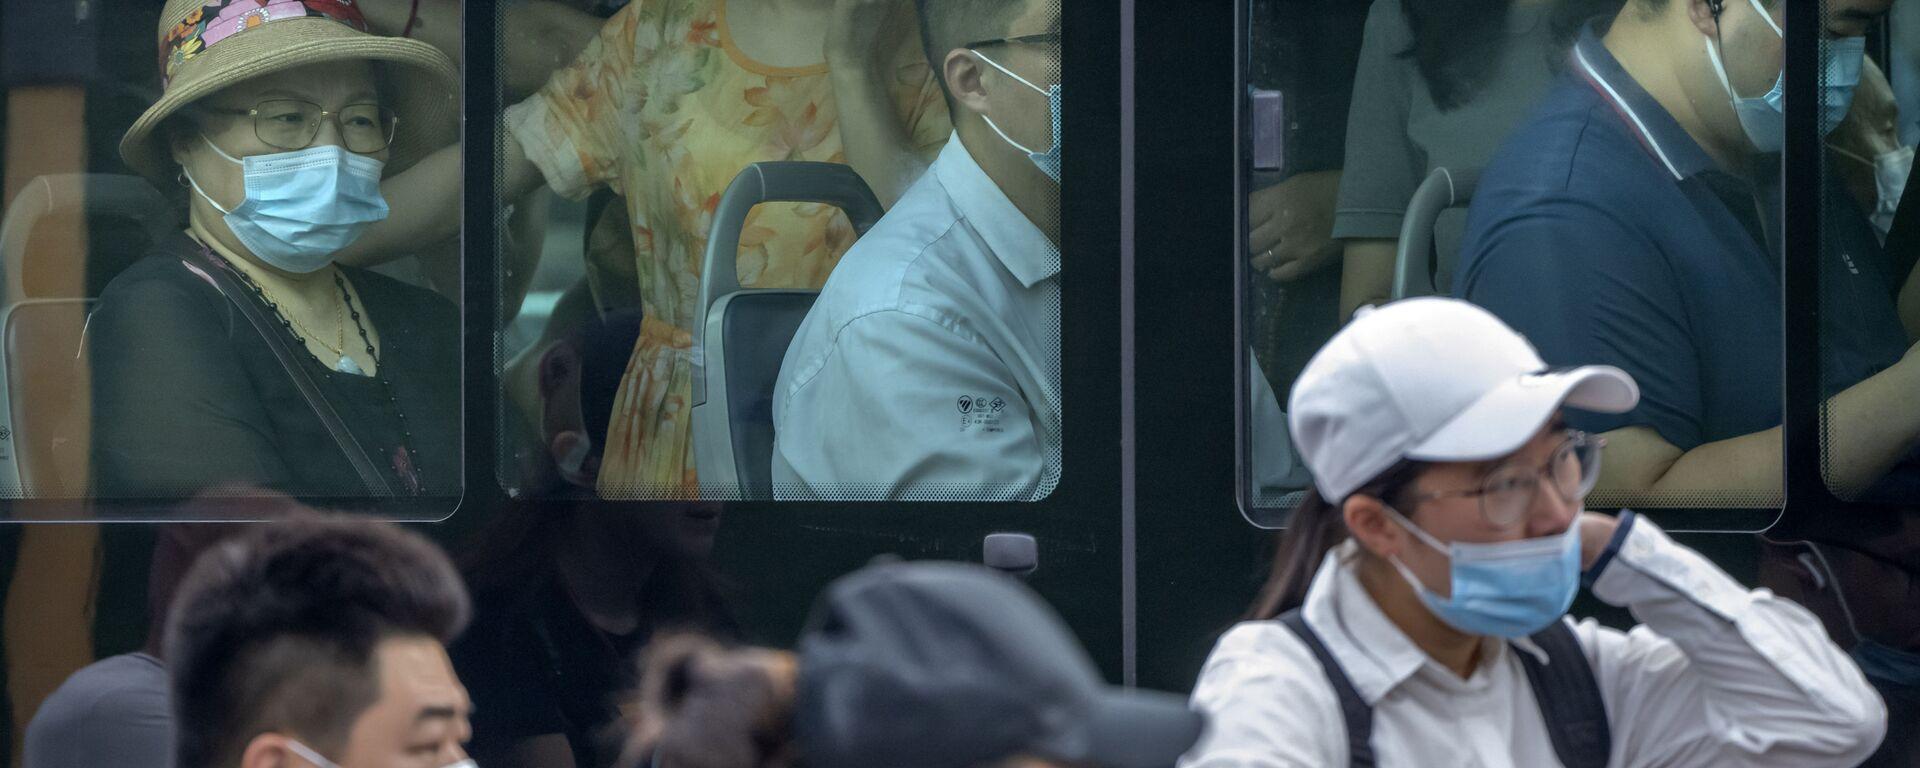 Lidi v autobuse v Pekingu - Sputnik Česká republika, 1920, 13.08.2021